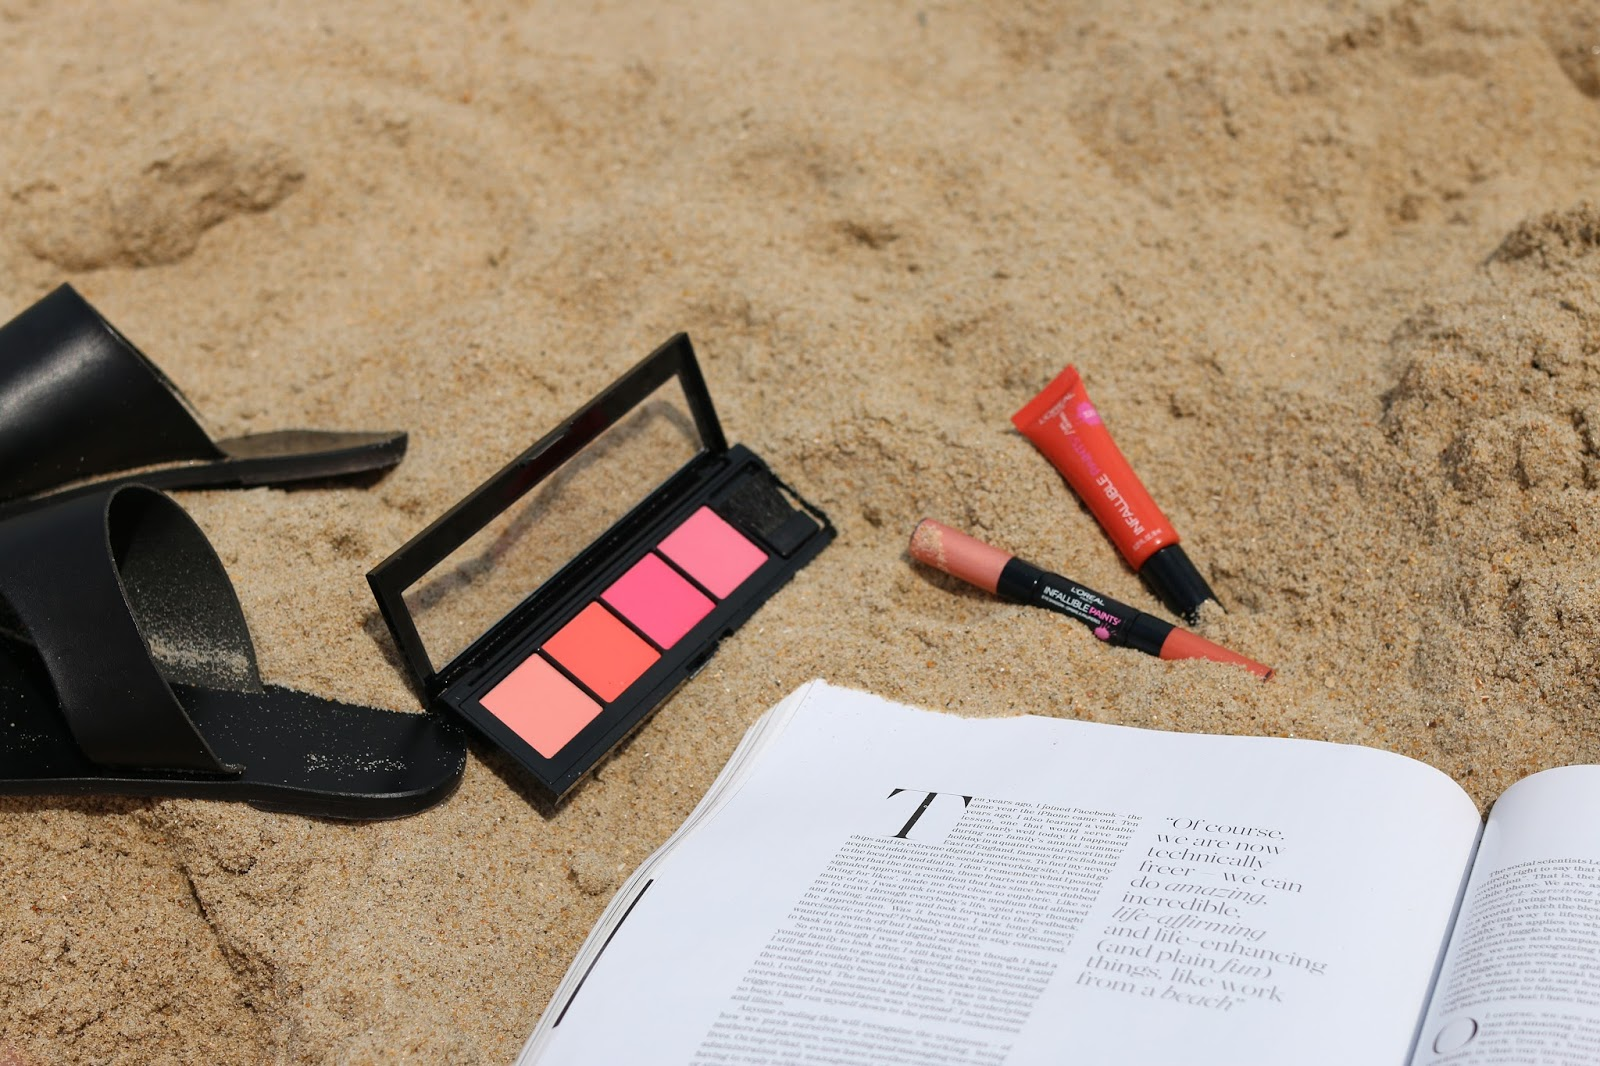 beauty blogger, beach outfit, beach makeup, orange makeup look, peachy makeup look, how to, tutorial, youtube, summer makeup, summer beauty, loreal, loreal paris, infallible paints, review